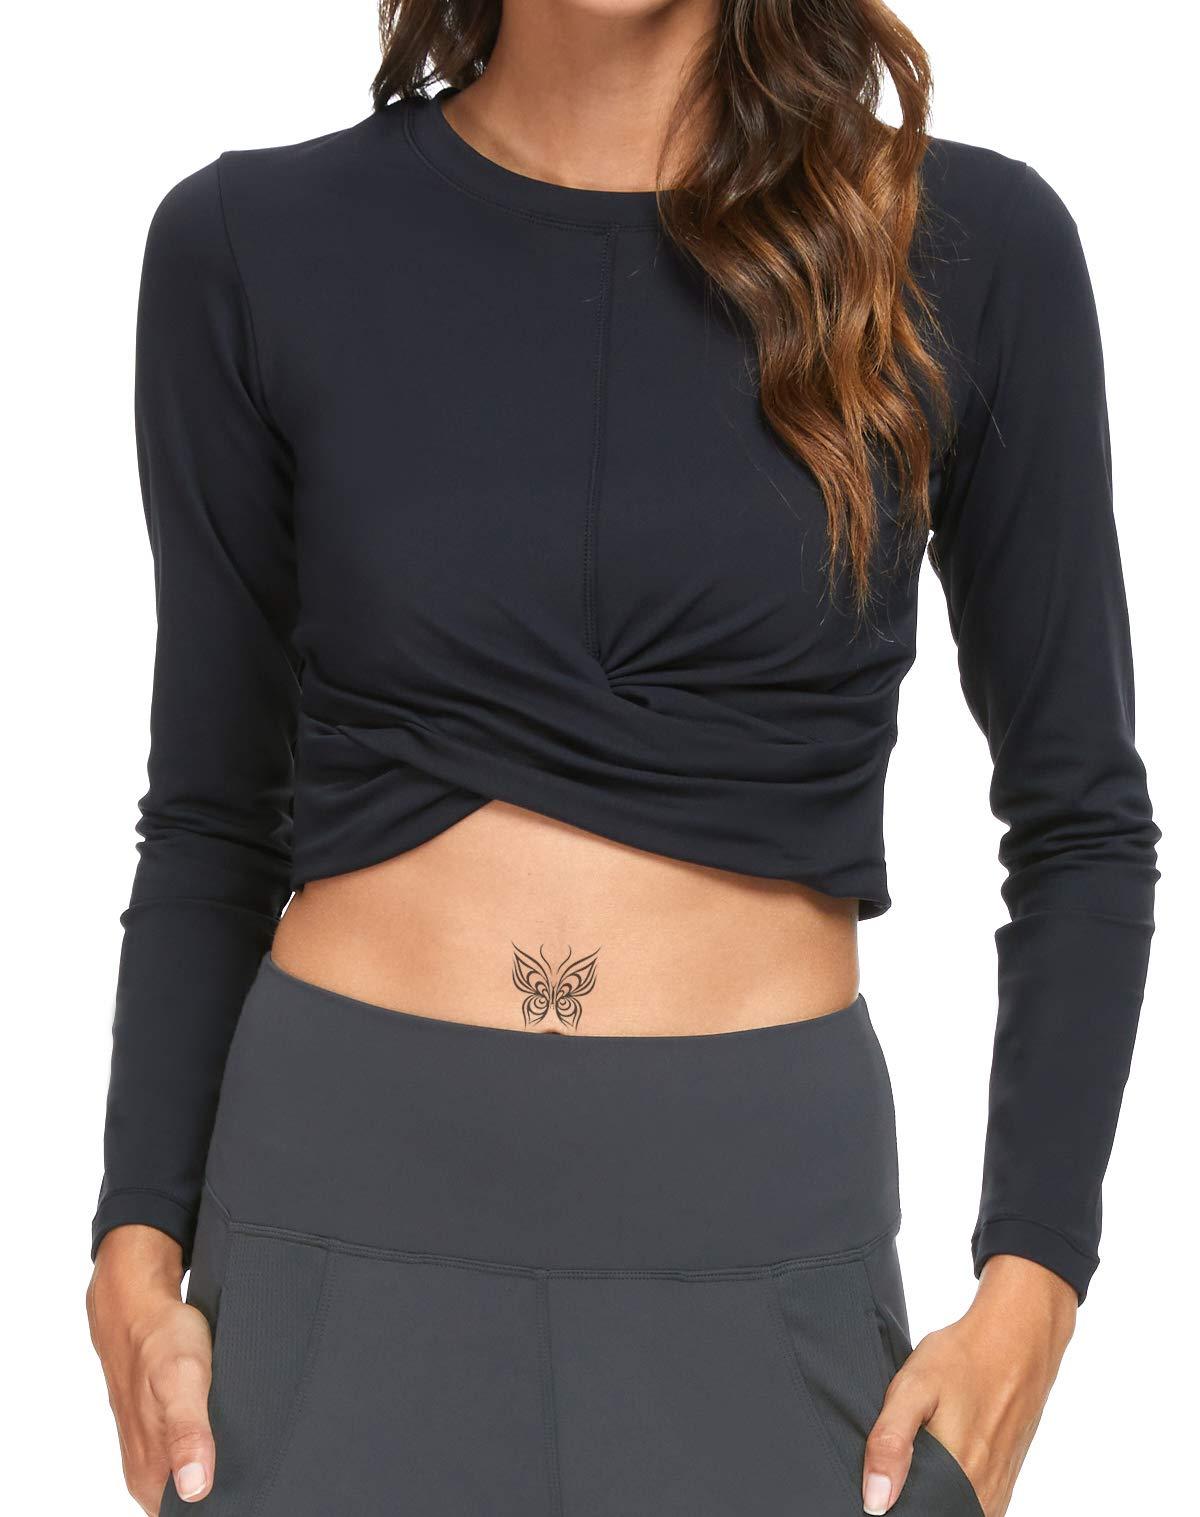 Crop Tops for Women Long Sleeve Yoga Running Shirts Workout Gym Twist